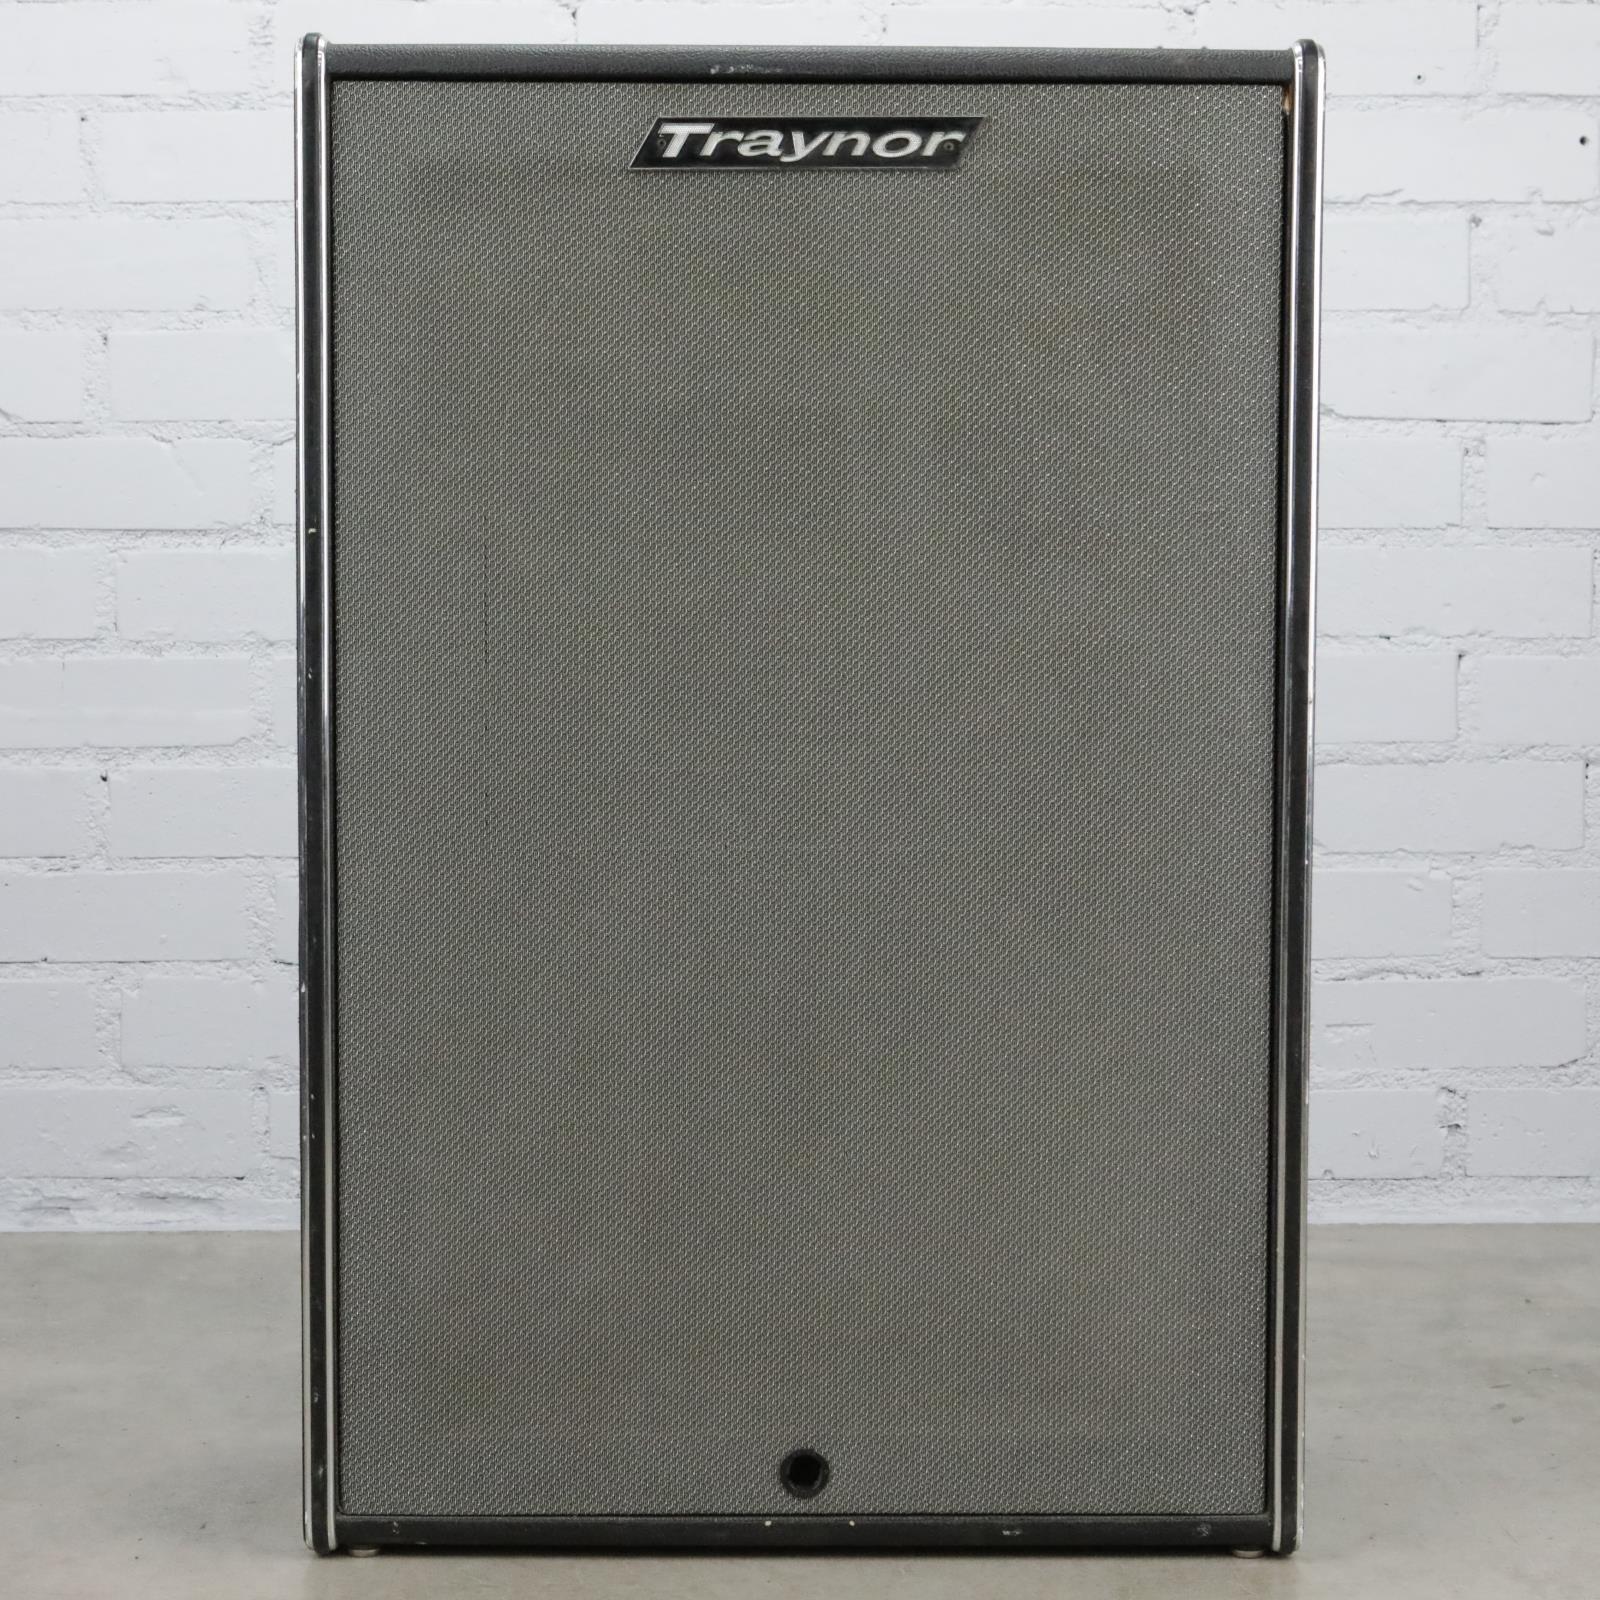 Traynor YT-15 Bass 2x15 Speaker Cabinet Cab #40402